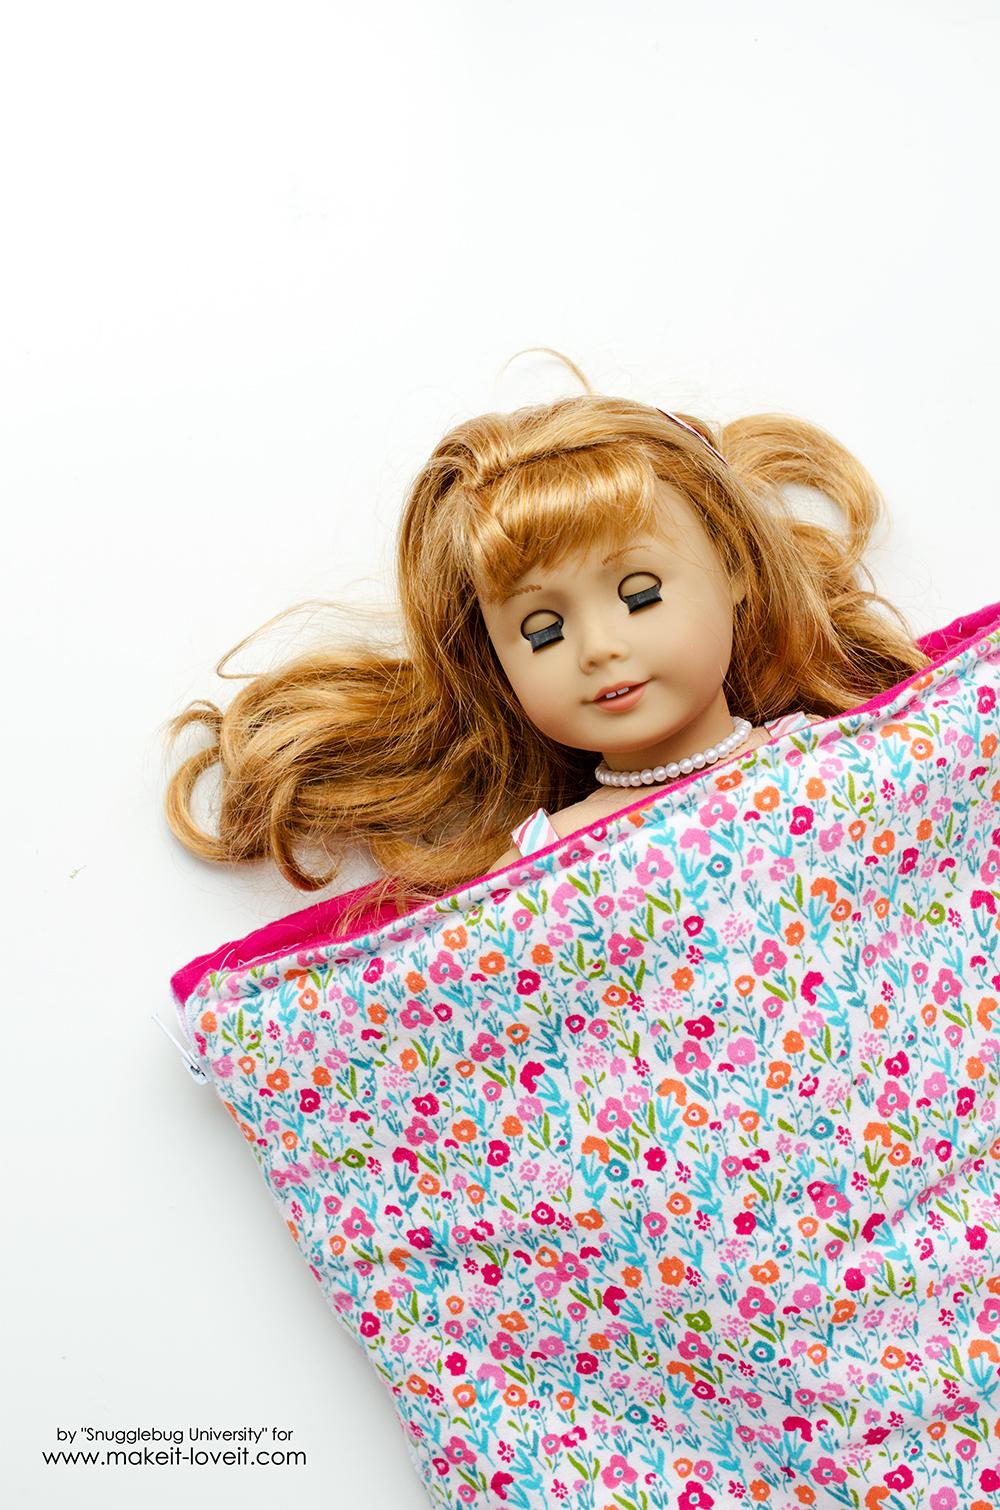 Sew a Sleeping Bag for an 18 Inch Doll | via makeit-loveit.com